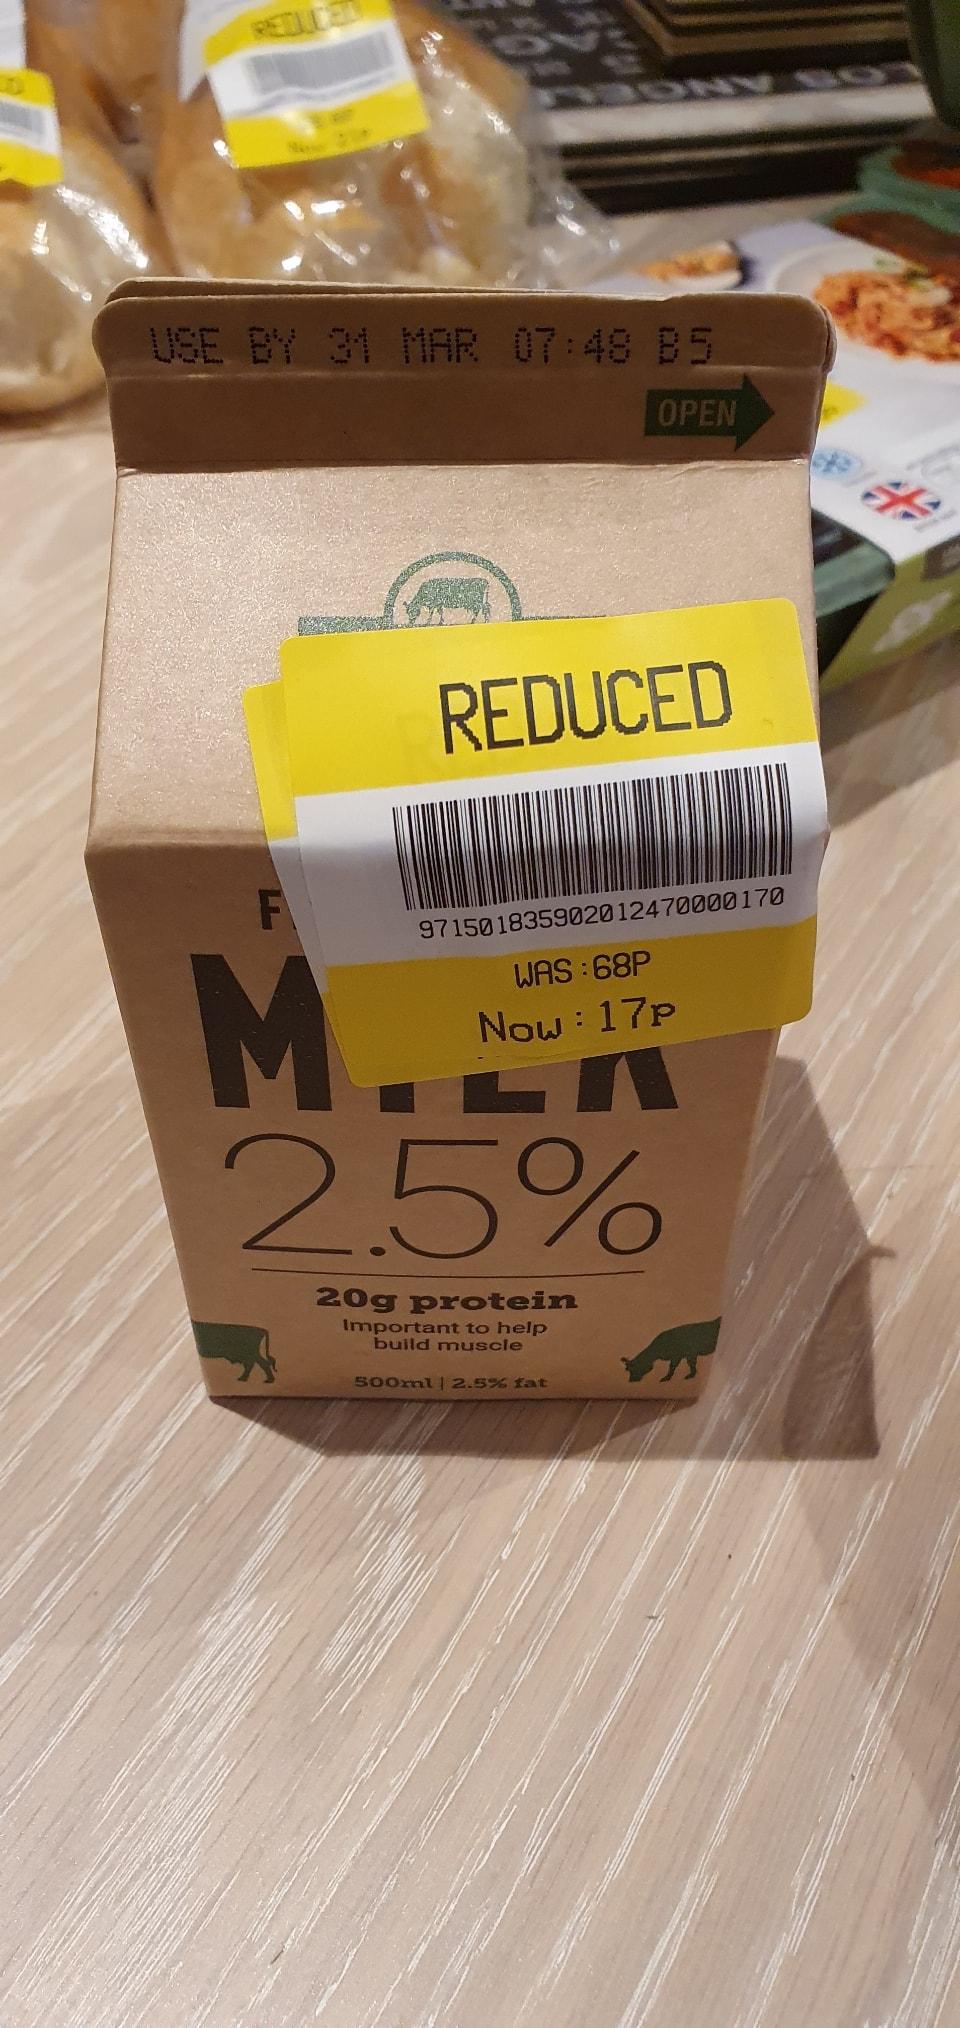 Milk 2.5%